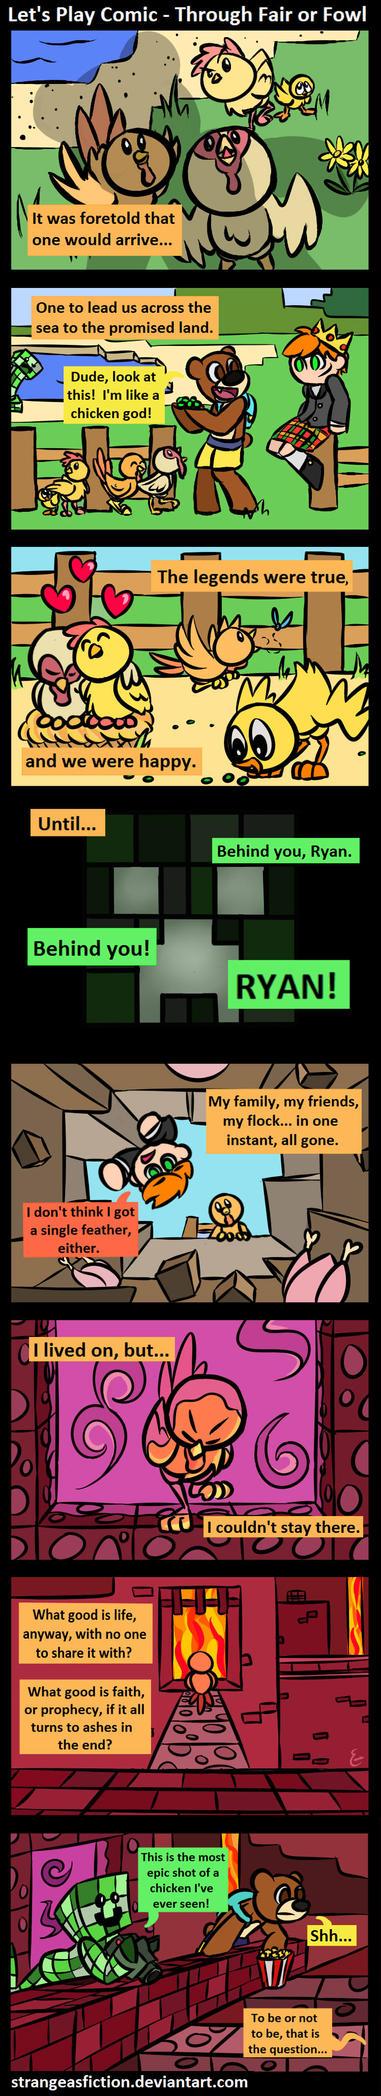 Let's Play Comic: Through Fair or Fowl by StrangeAsFiction